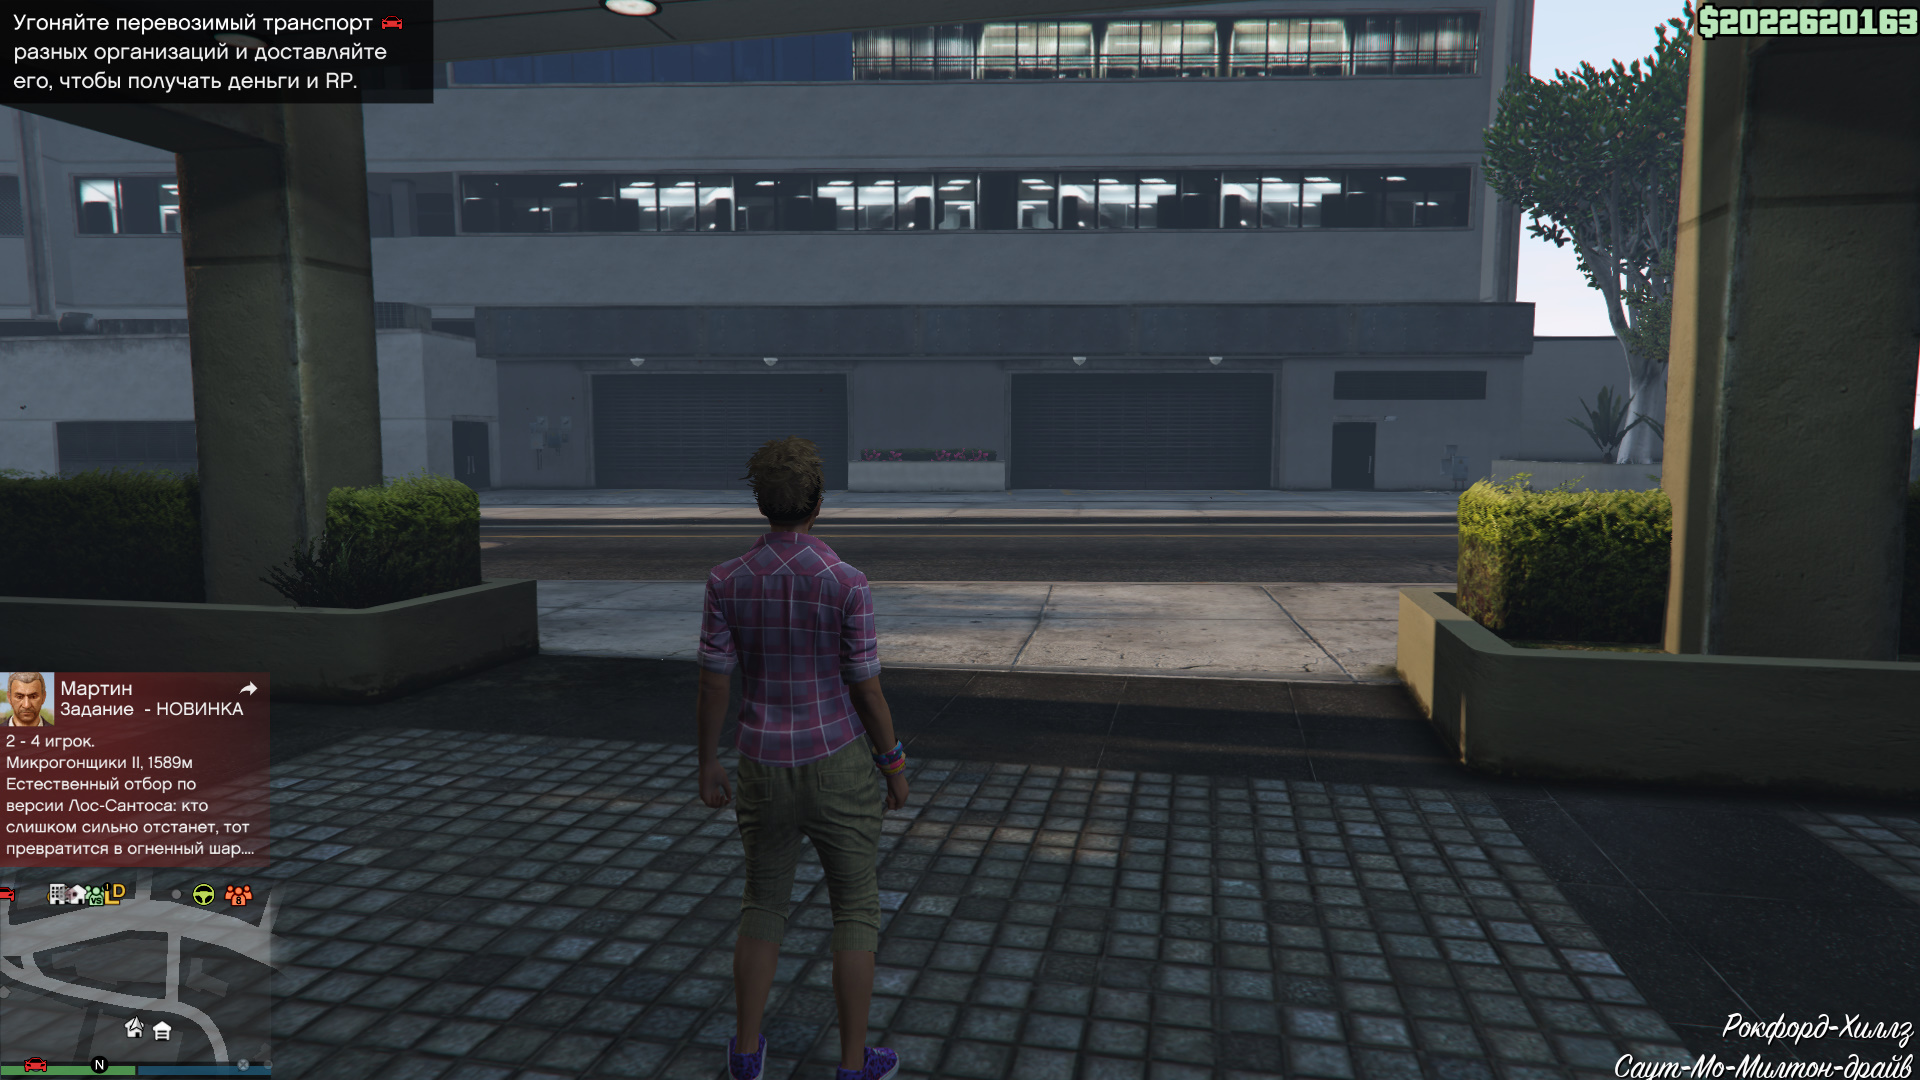 GTA5 2017-06-09 22-24-58-339.jpg - Grand Theft Auto 5